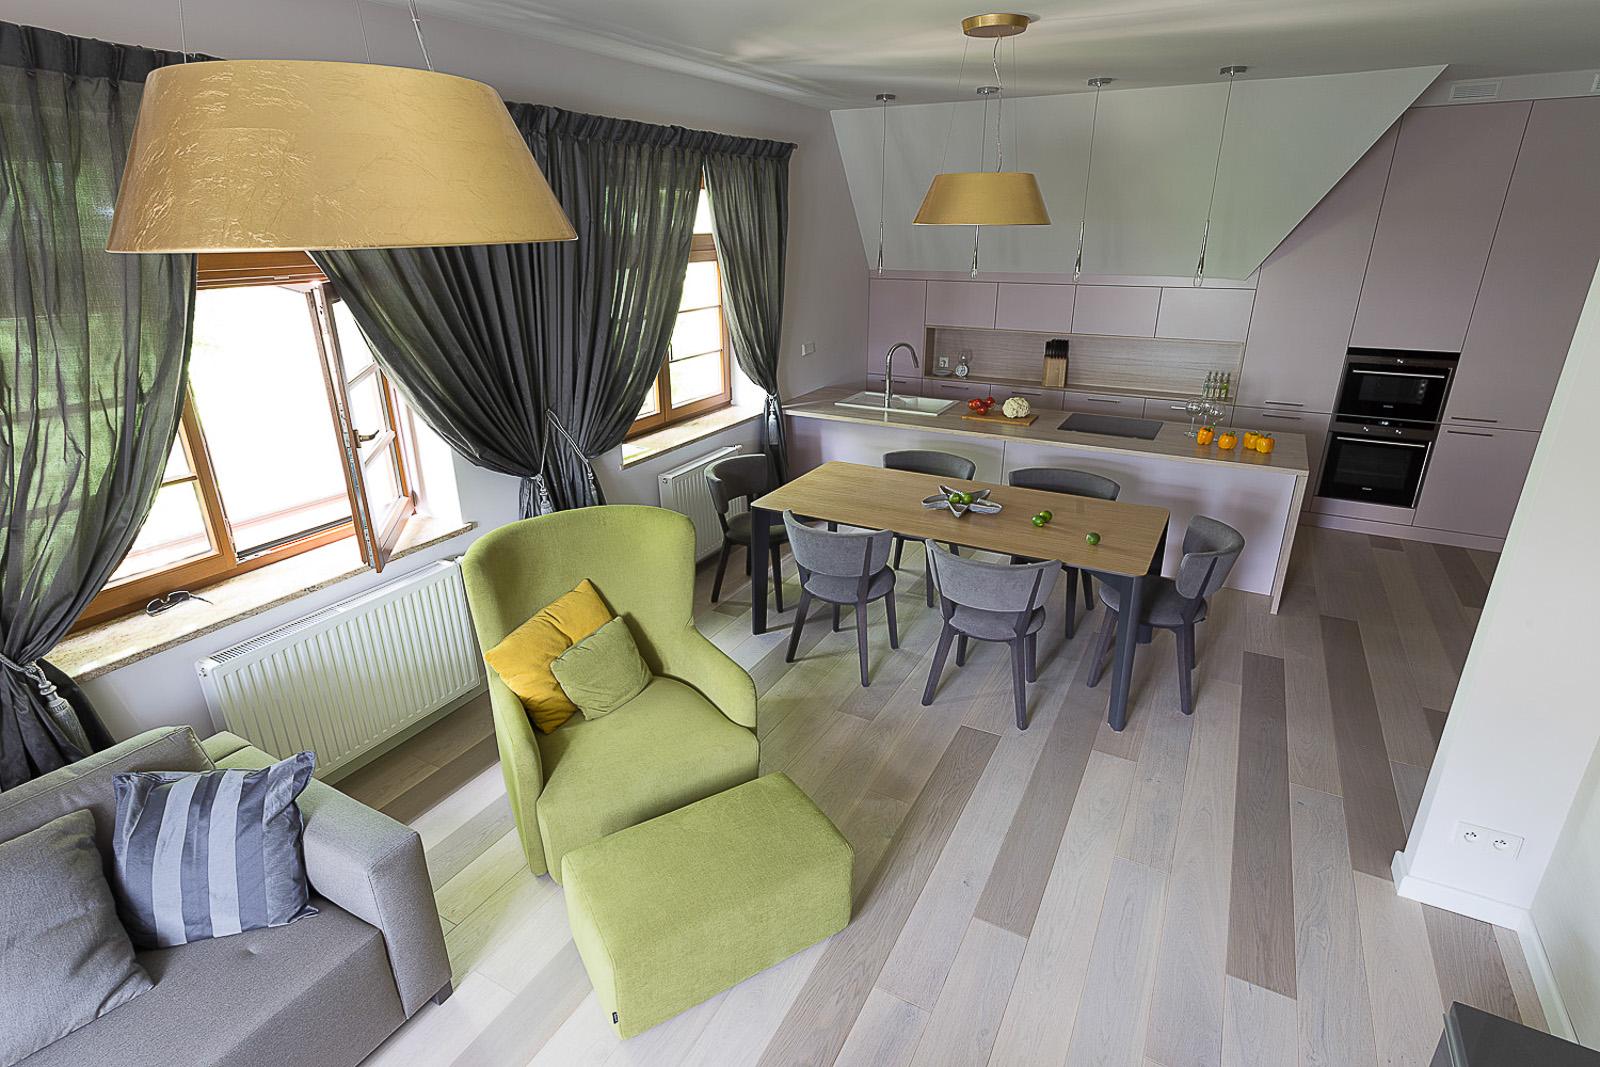 Apartament w Sopocie. Salon, kuchnia i jadalnia.